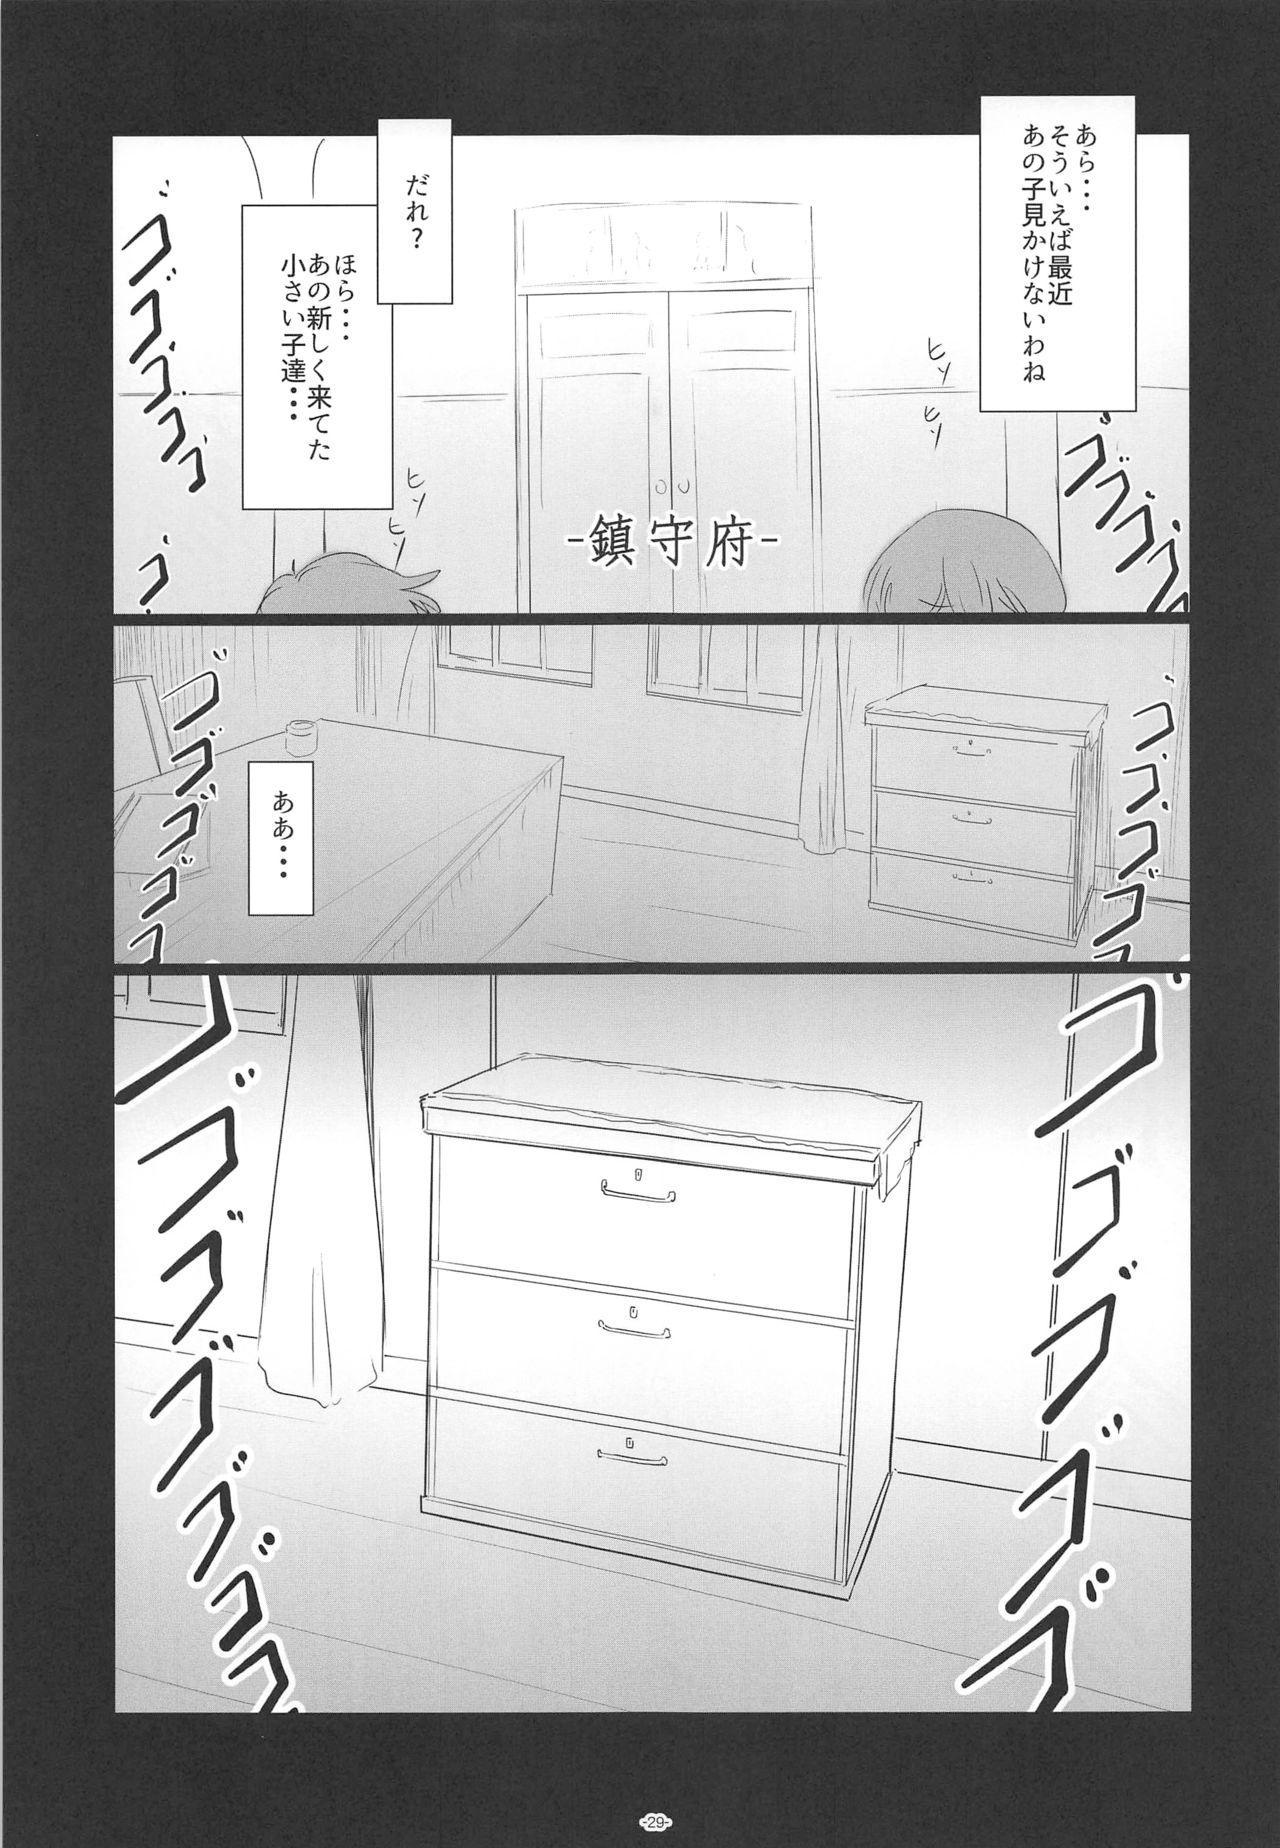 Korokoro-Manman II Korokoro:P Soushuuhen II 27